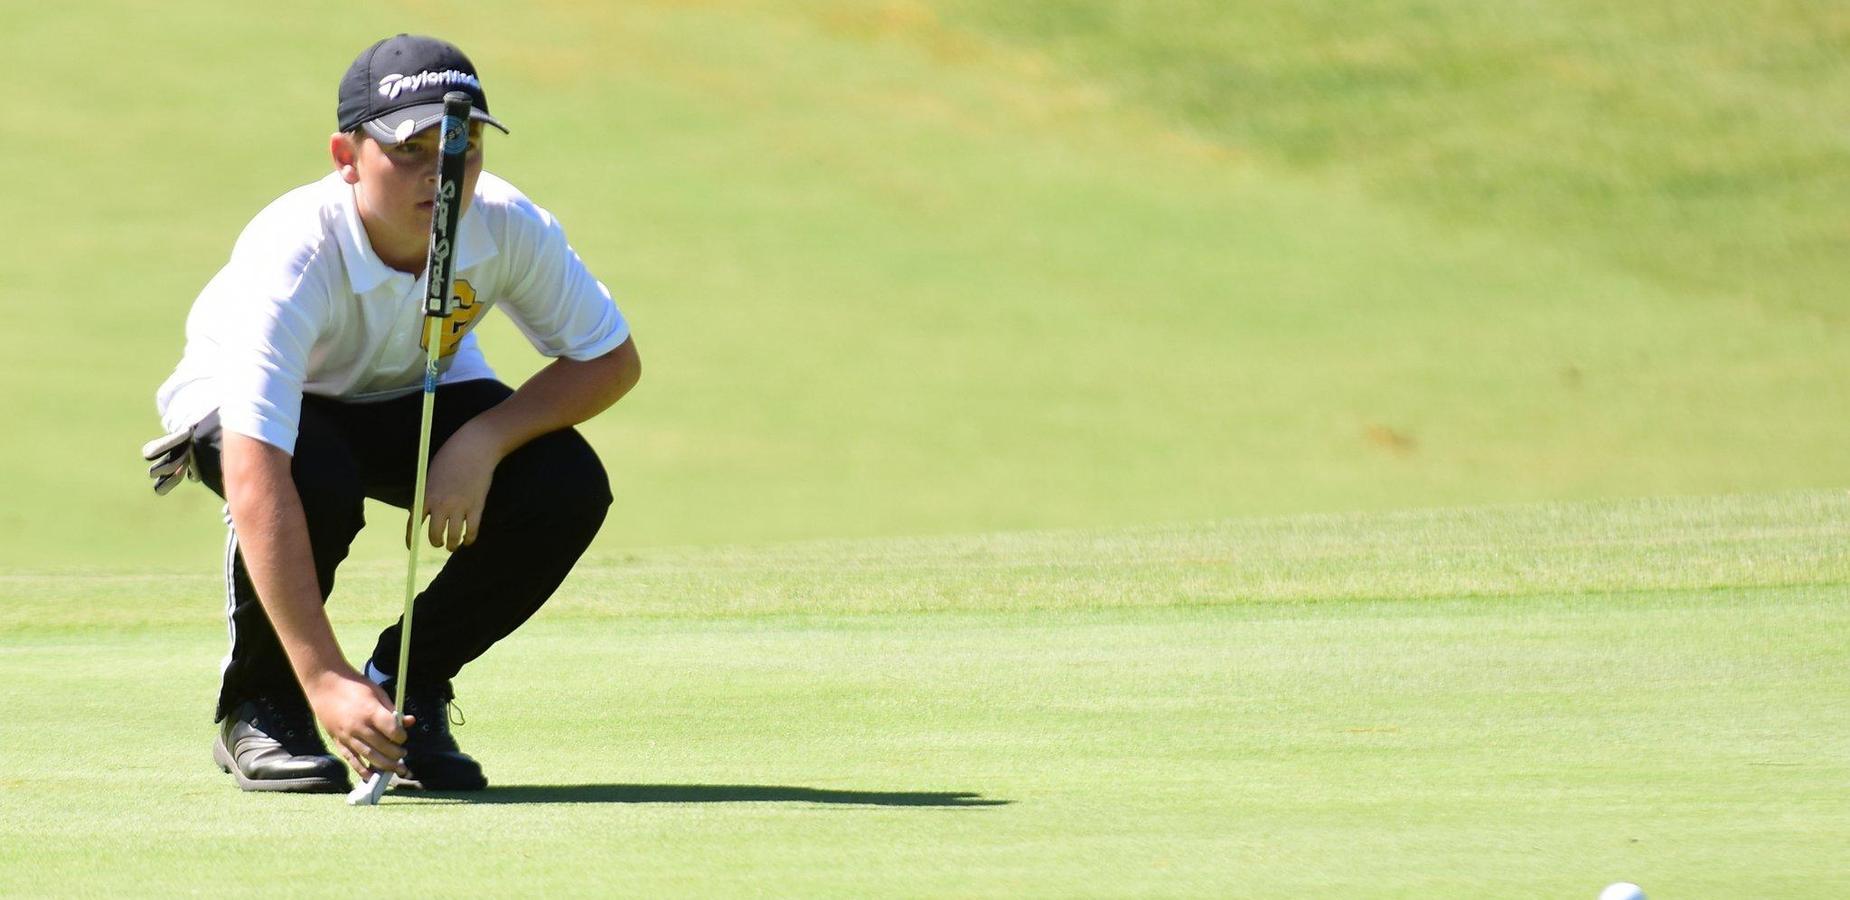 Golfer sets up for a putt